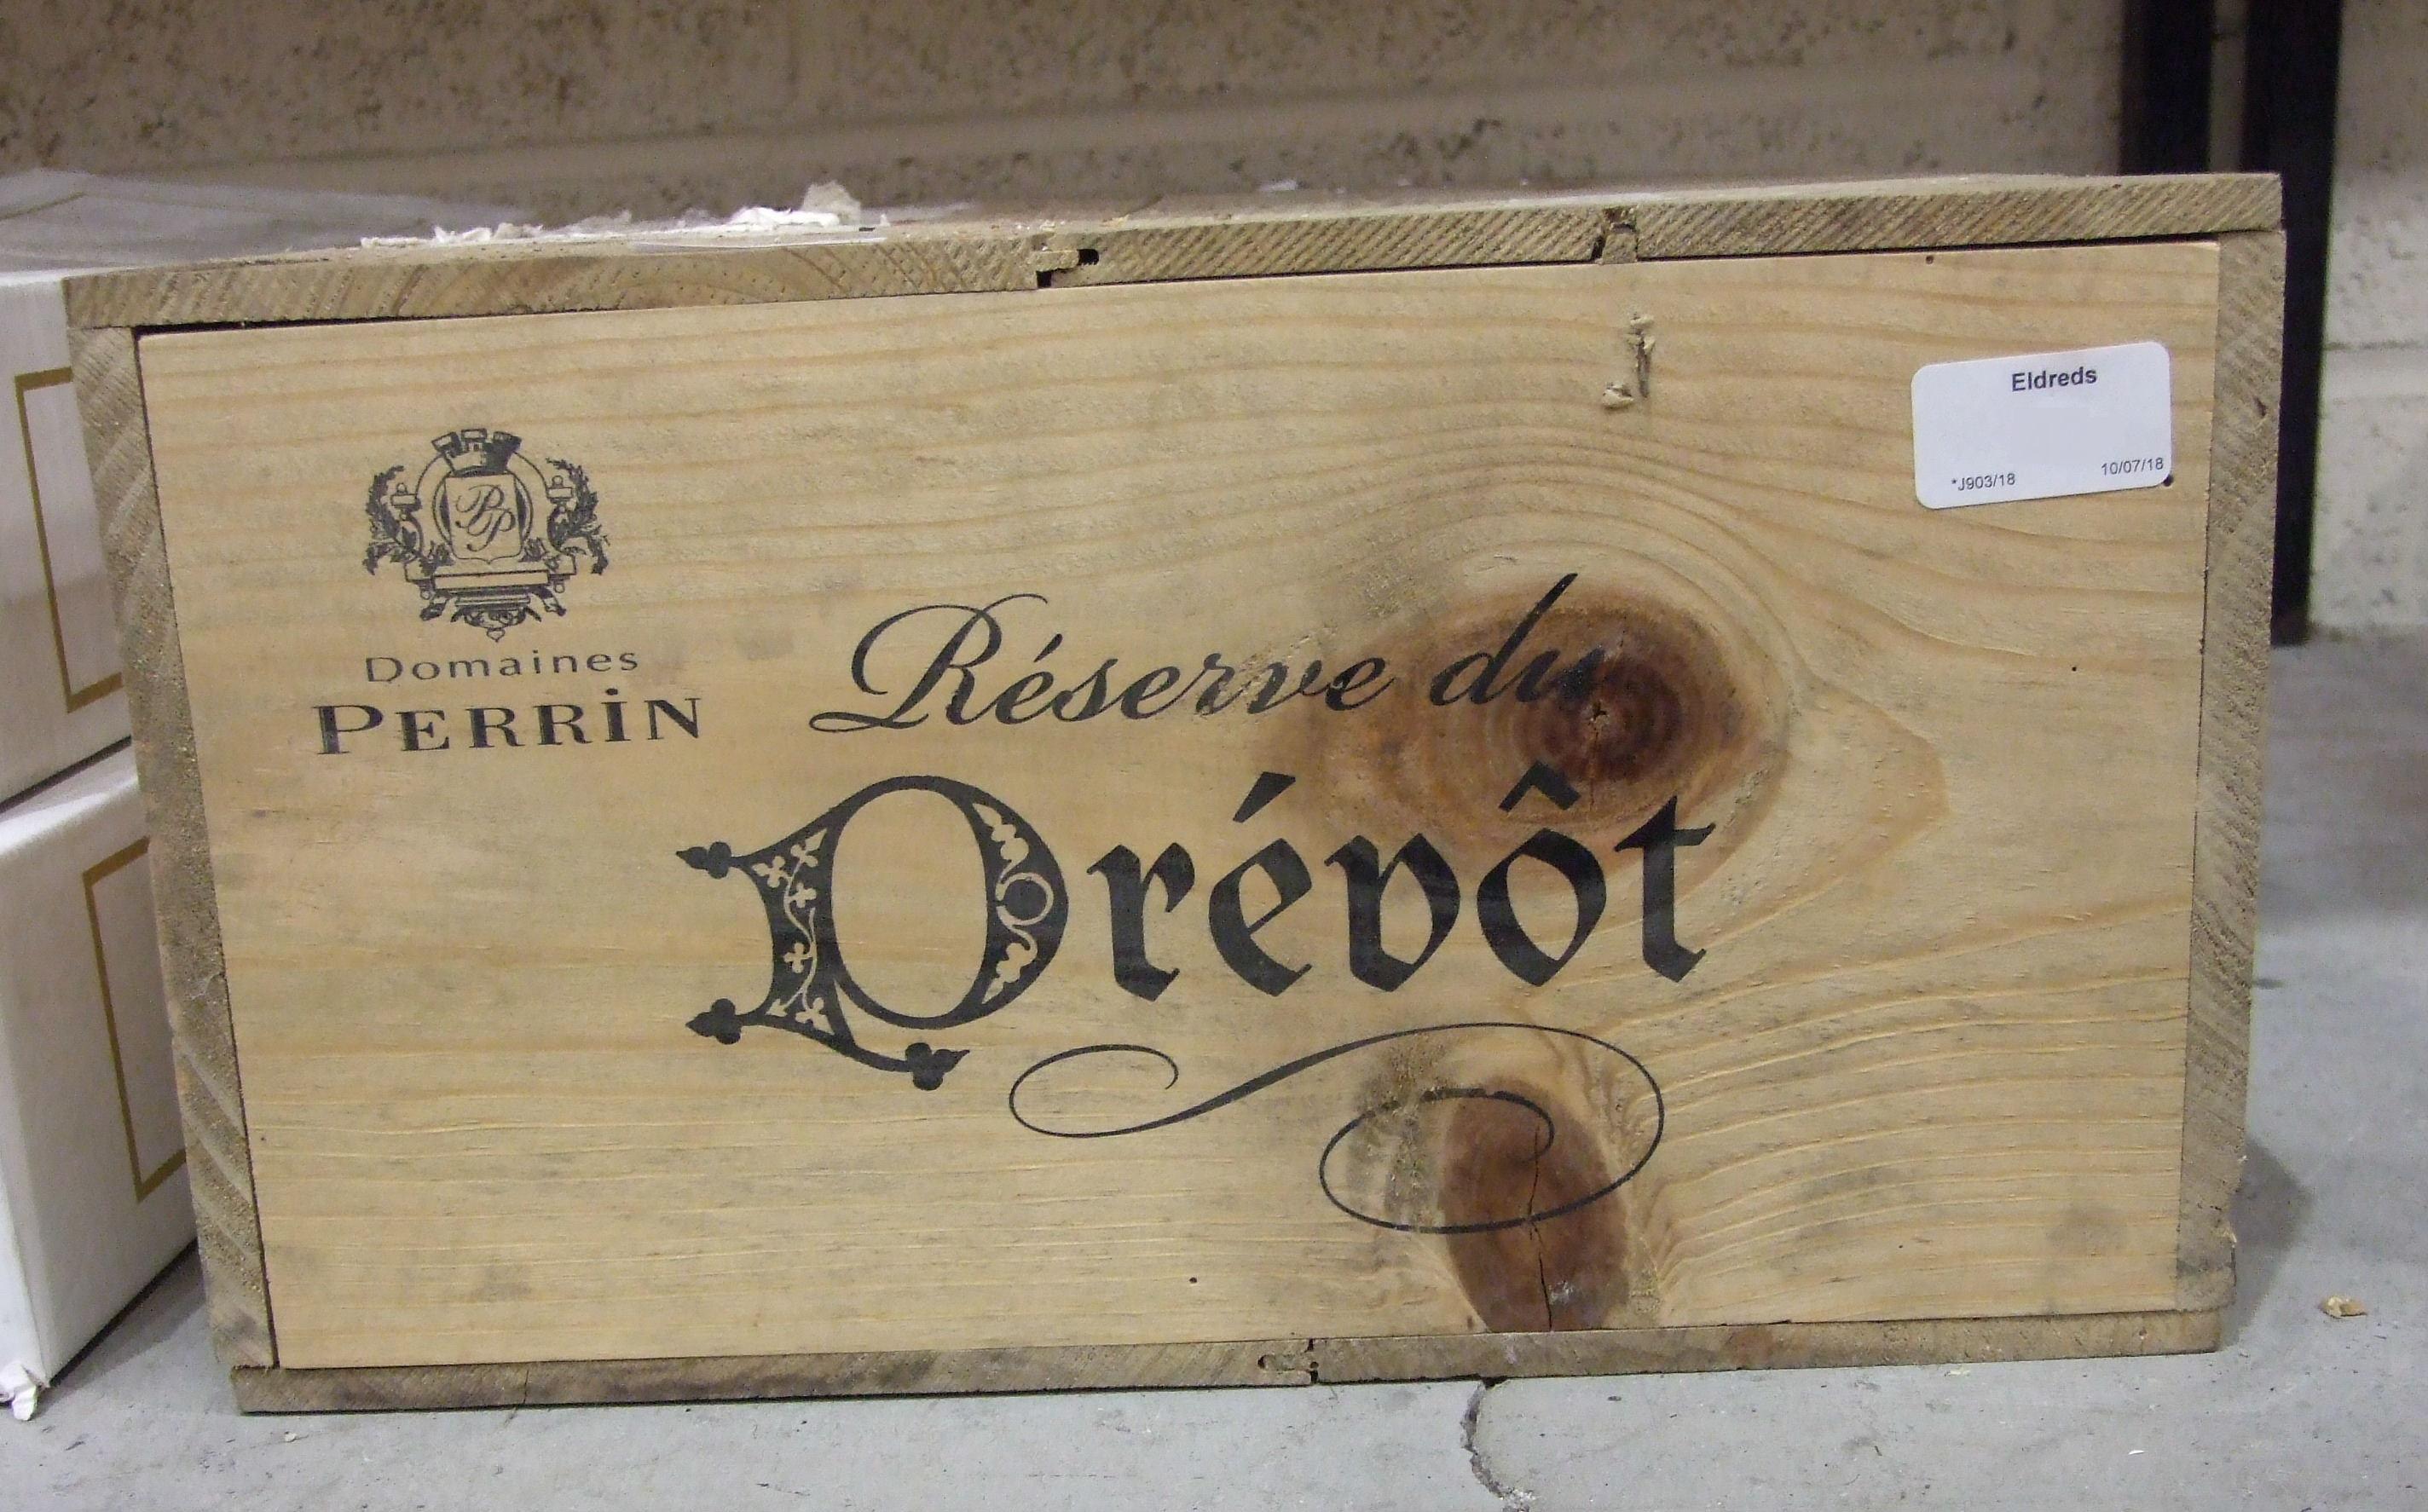 Lot 34 - Perrin Reserve de Prebot 2000, 12 bottles, Special Cuvée, OWC.